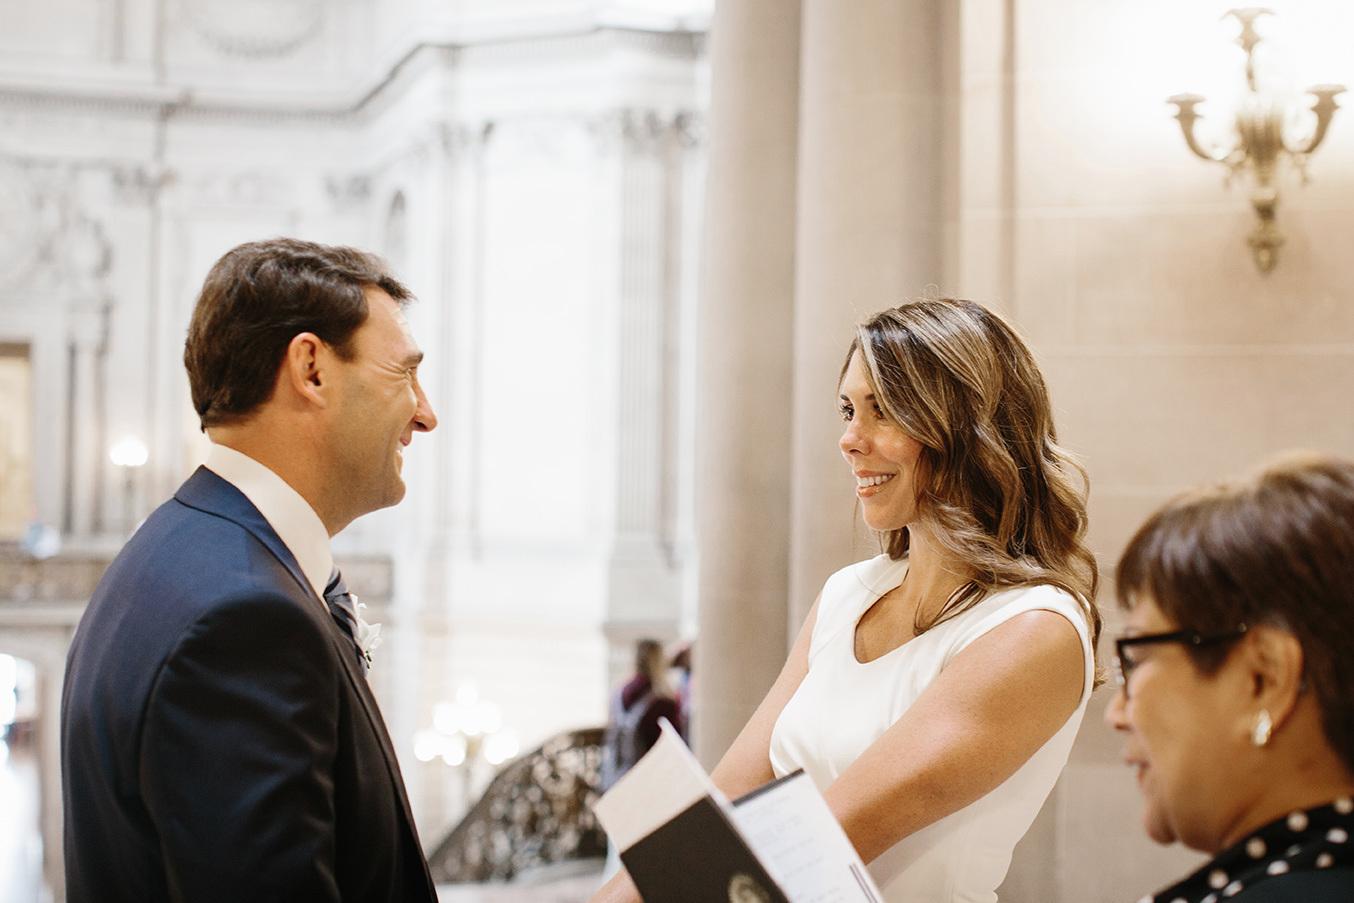 A civil ceremony at San Francisco City Hall